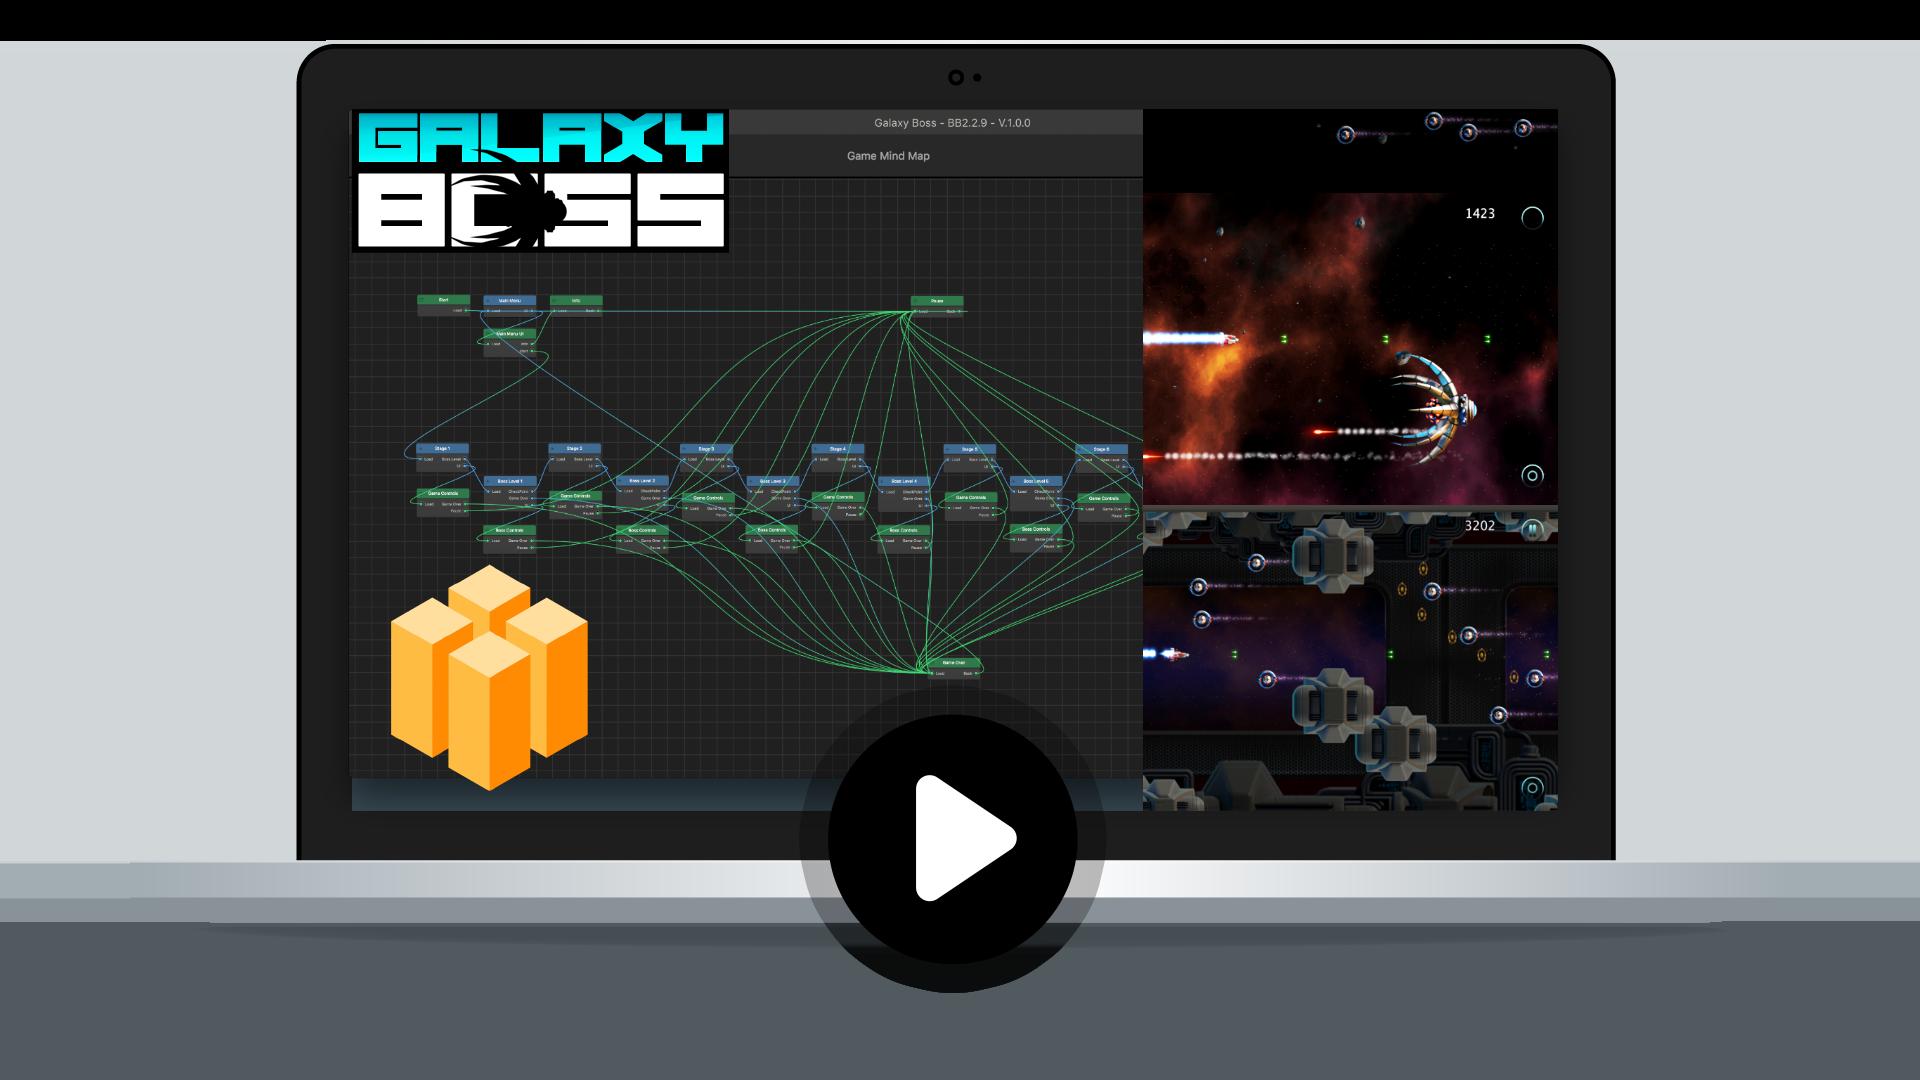 Galaxy Boss Demo - Buildbox Training Project